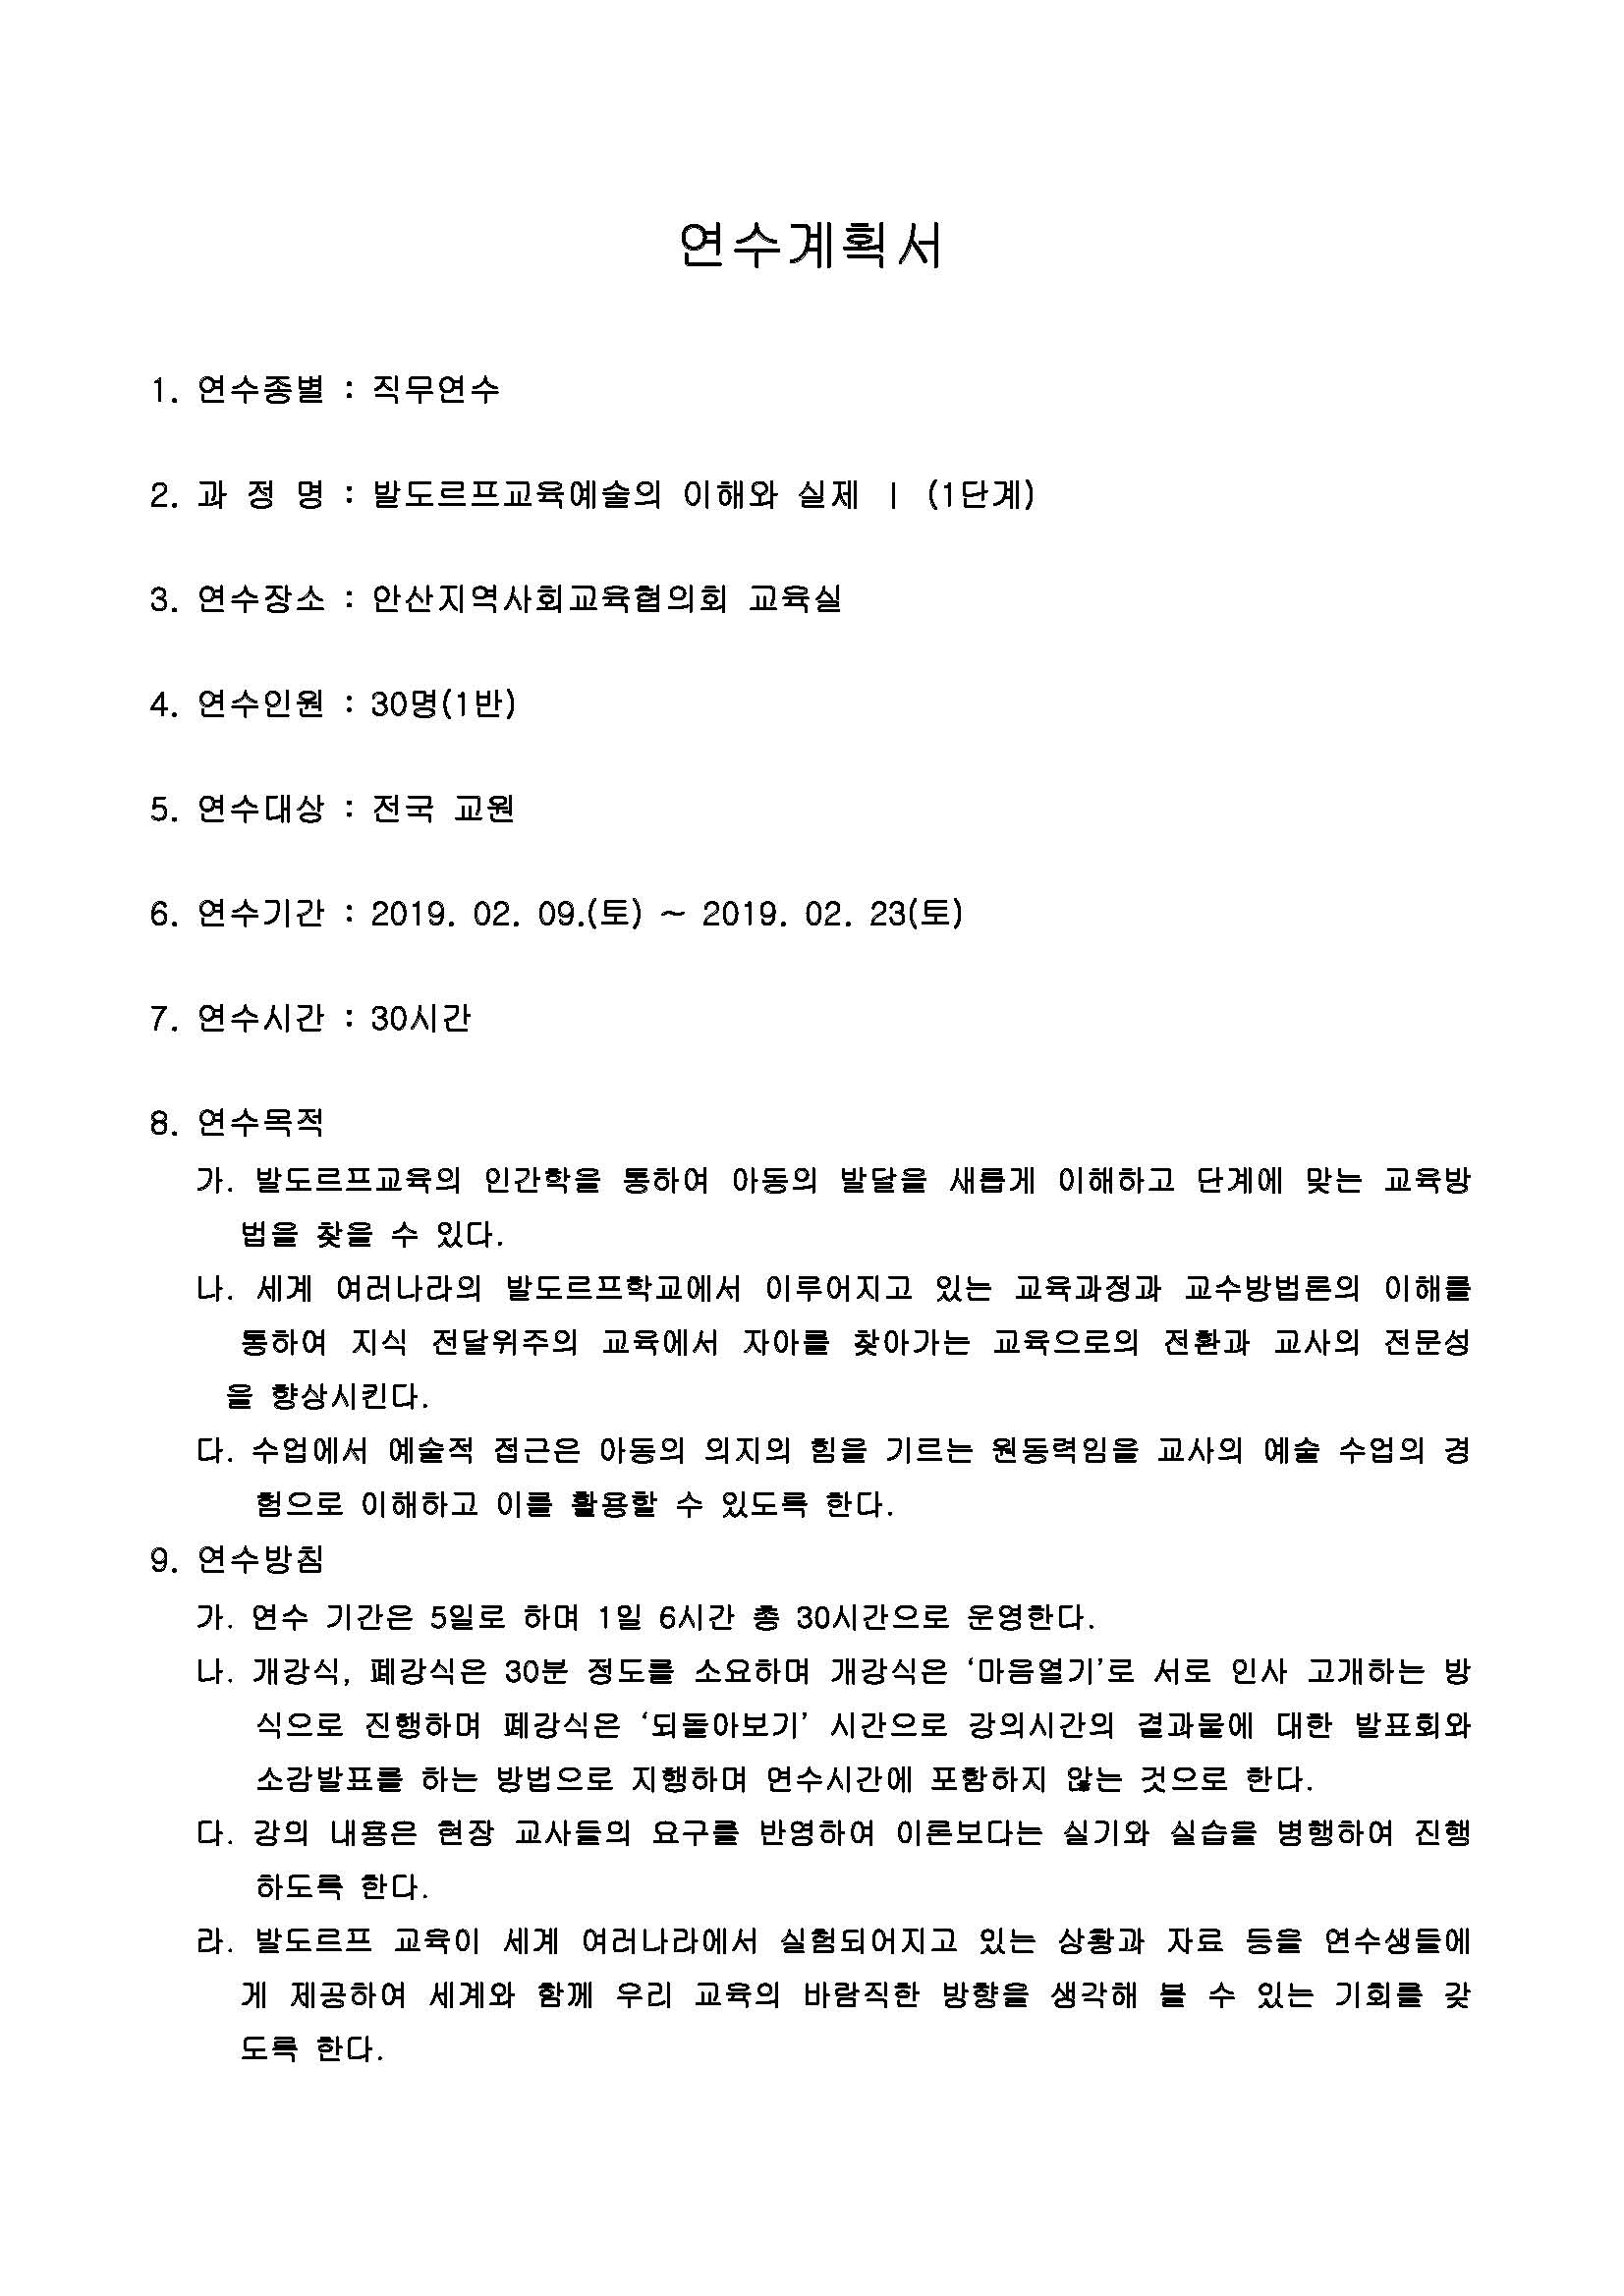 2018 KACE안산 교원 특수분야 연수_안내지_페이지_2.jpg